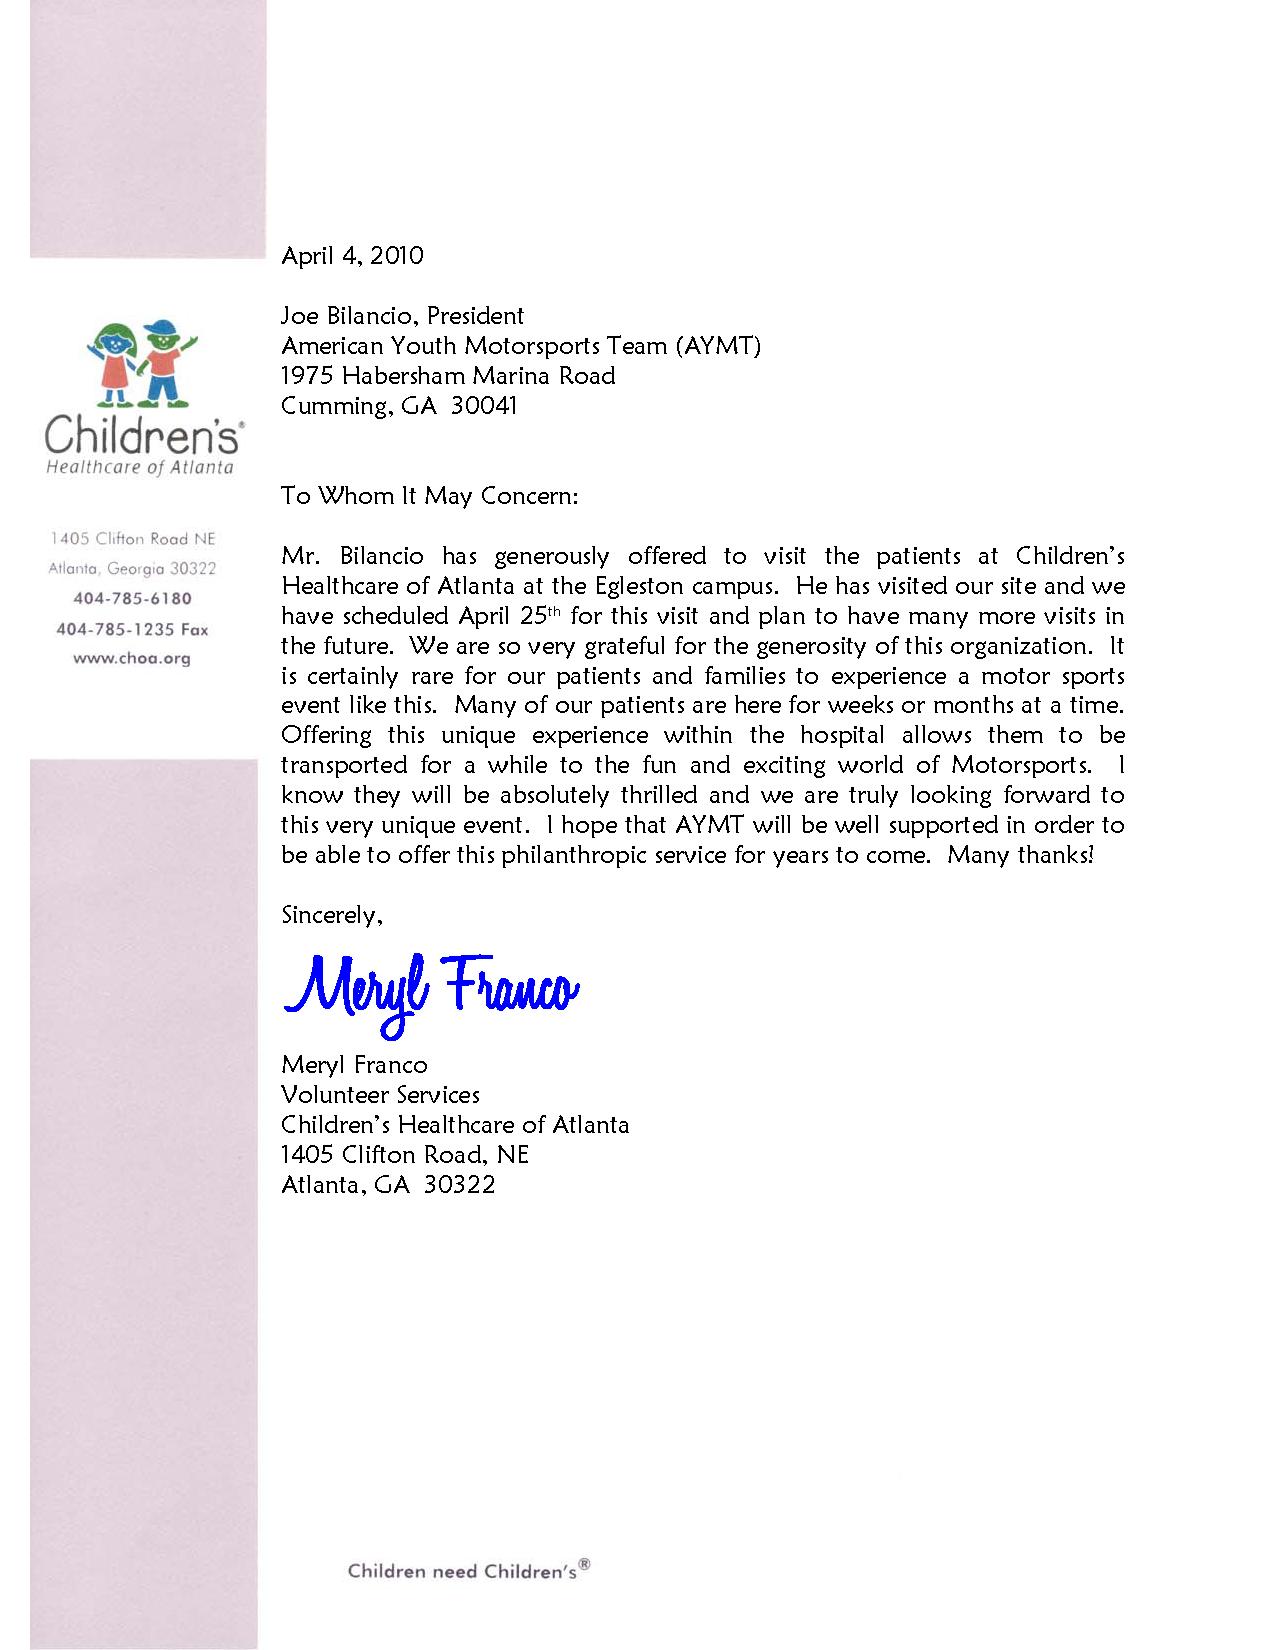 CHOA-Egleston-Emory Letter